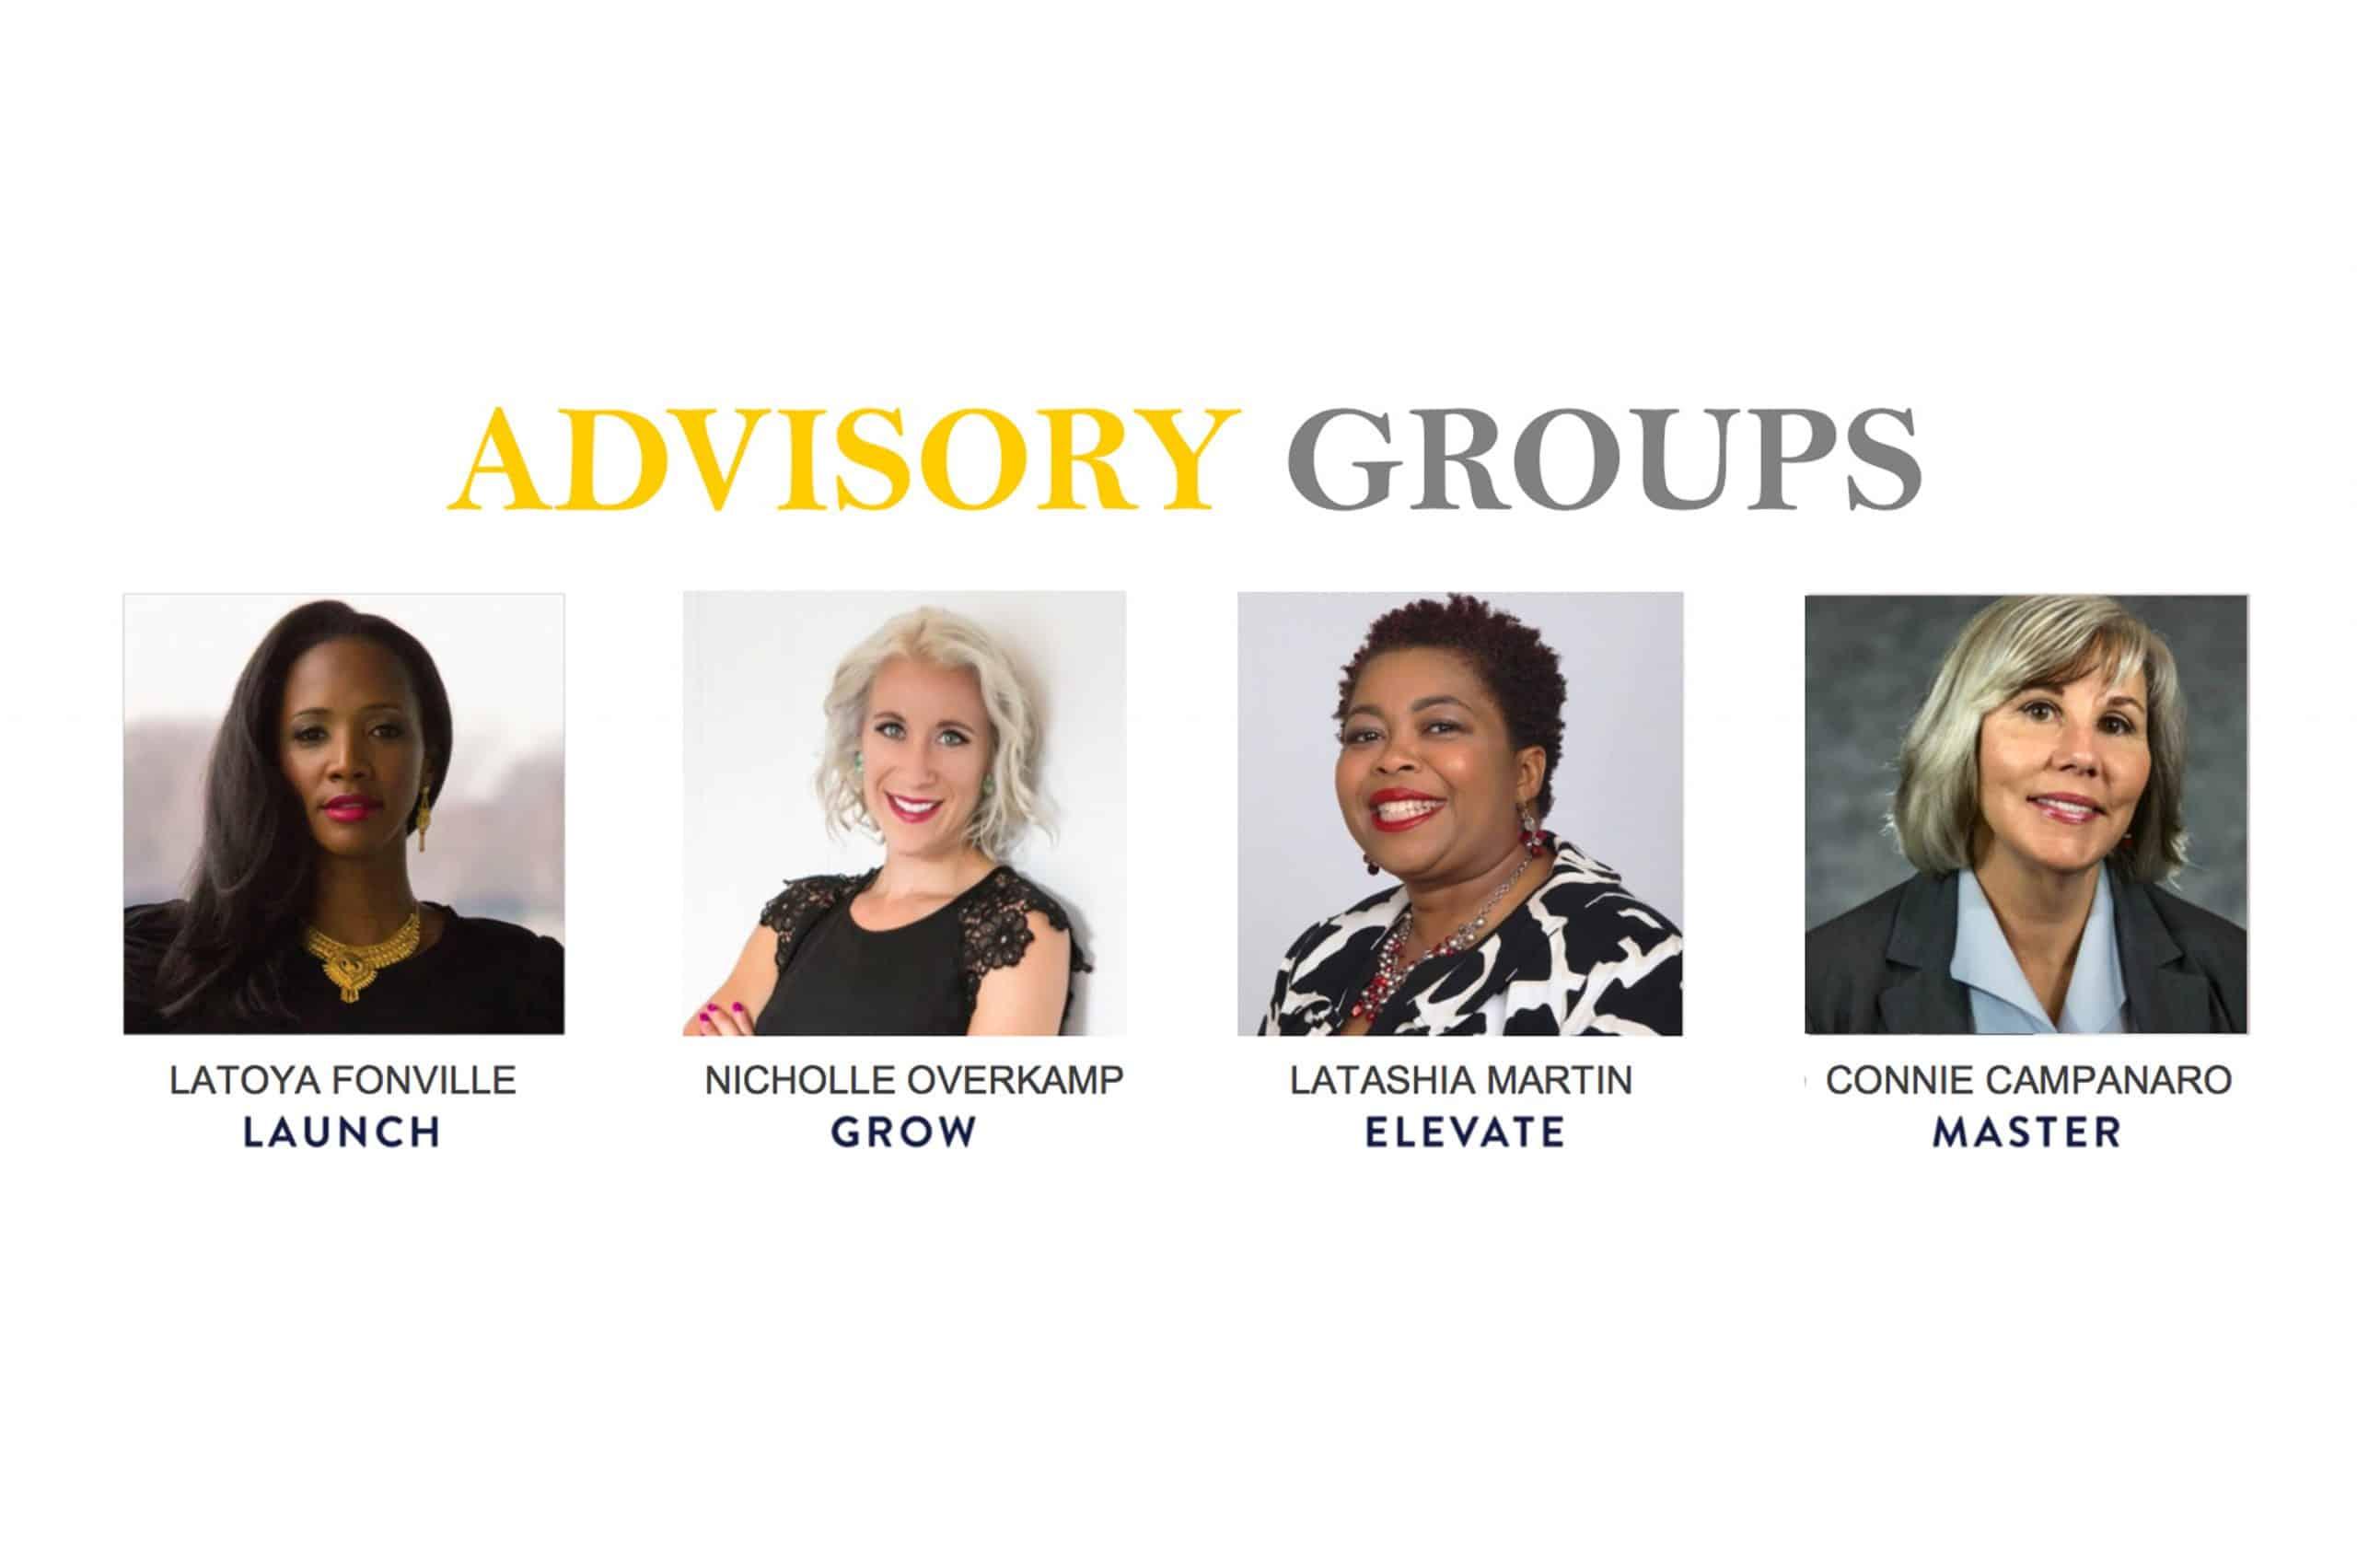 photos of advisory group facilitators